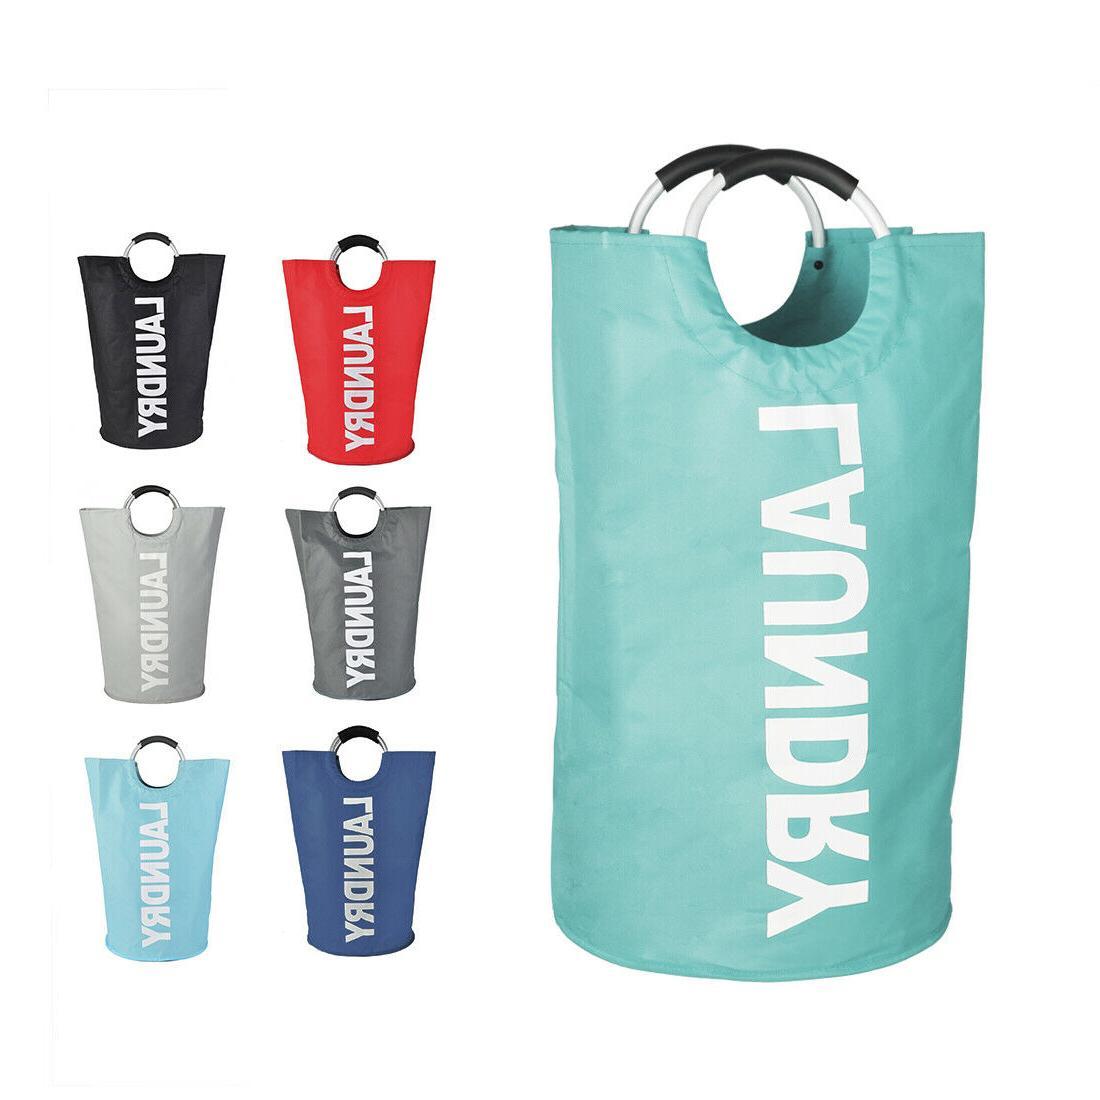 laundry basket portable waterproof clothes laundry washing